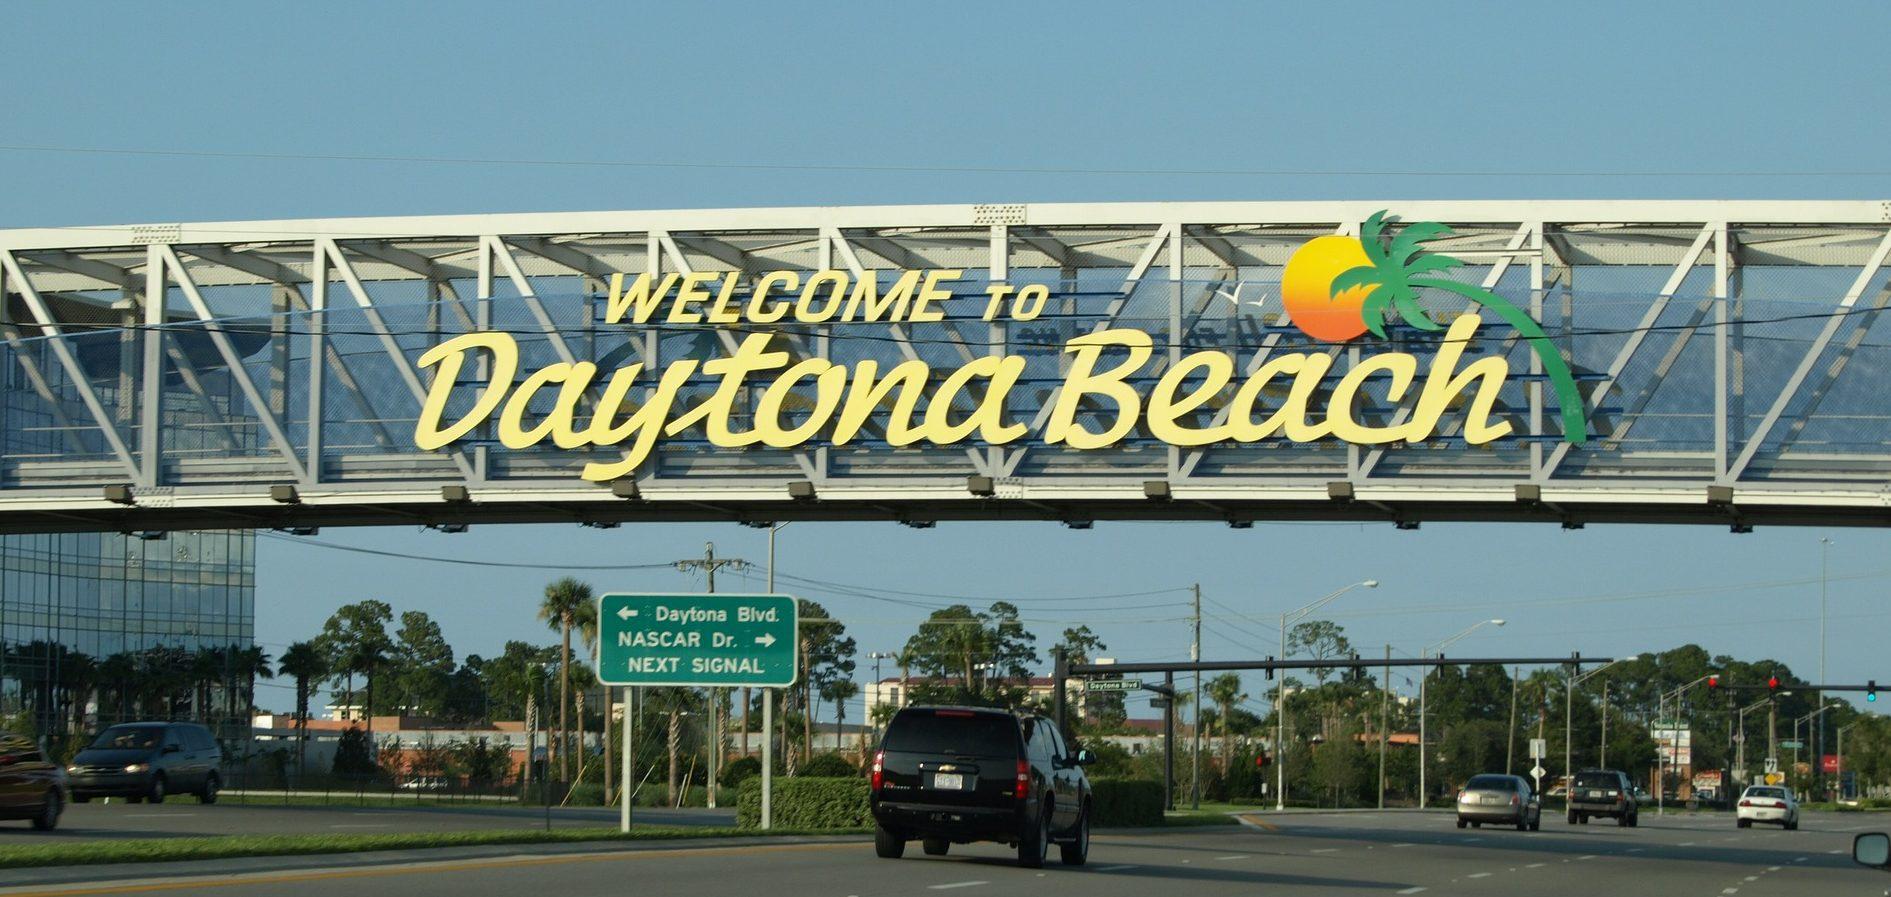 Gay Daytona Beach